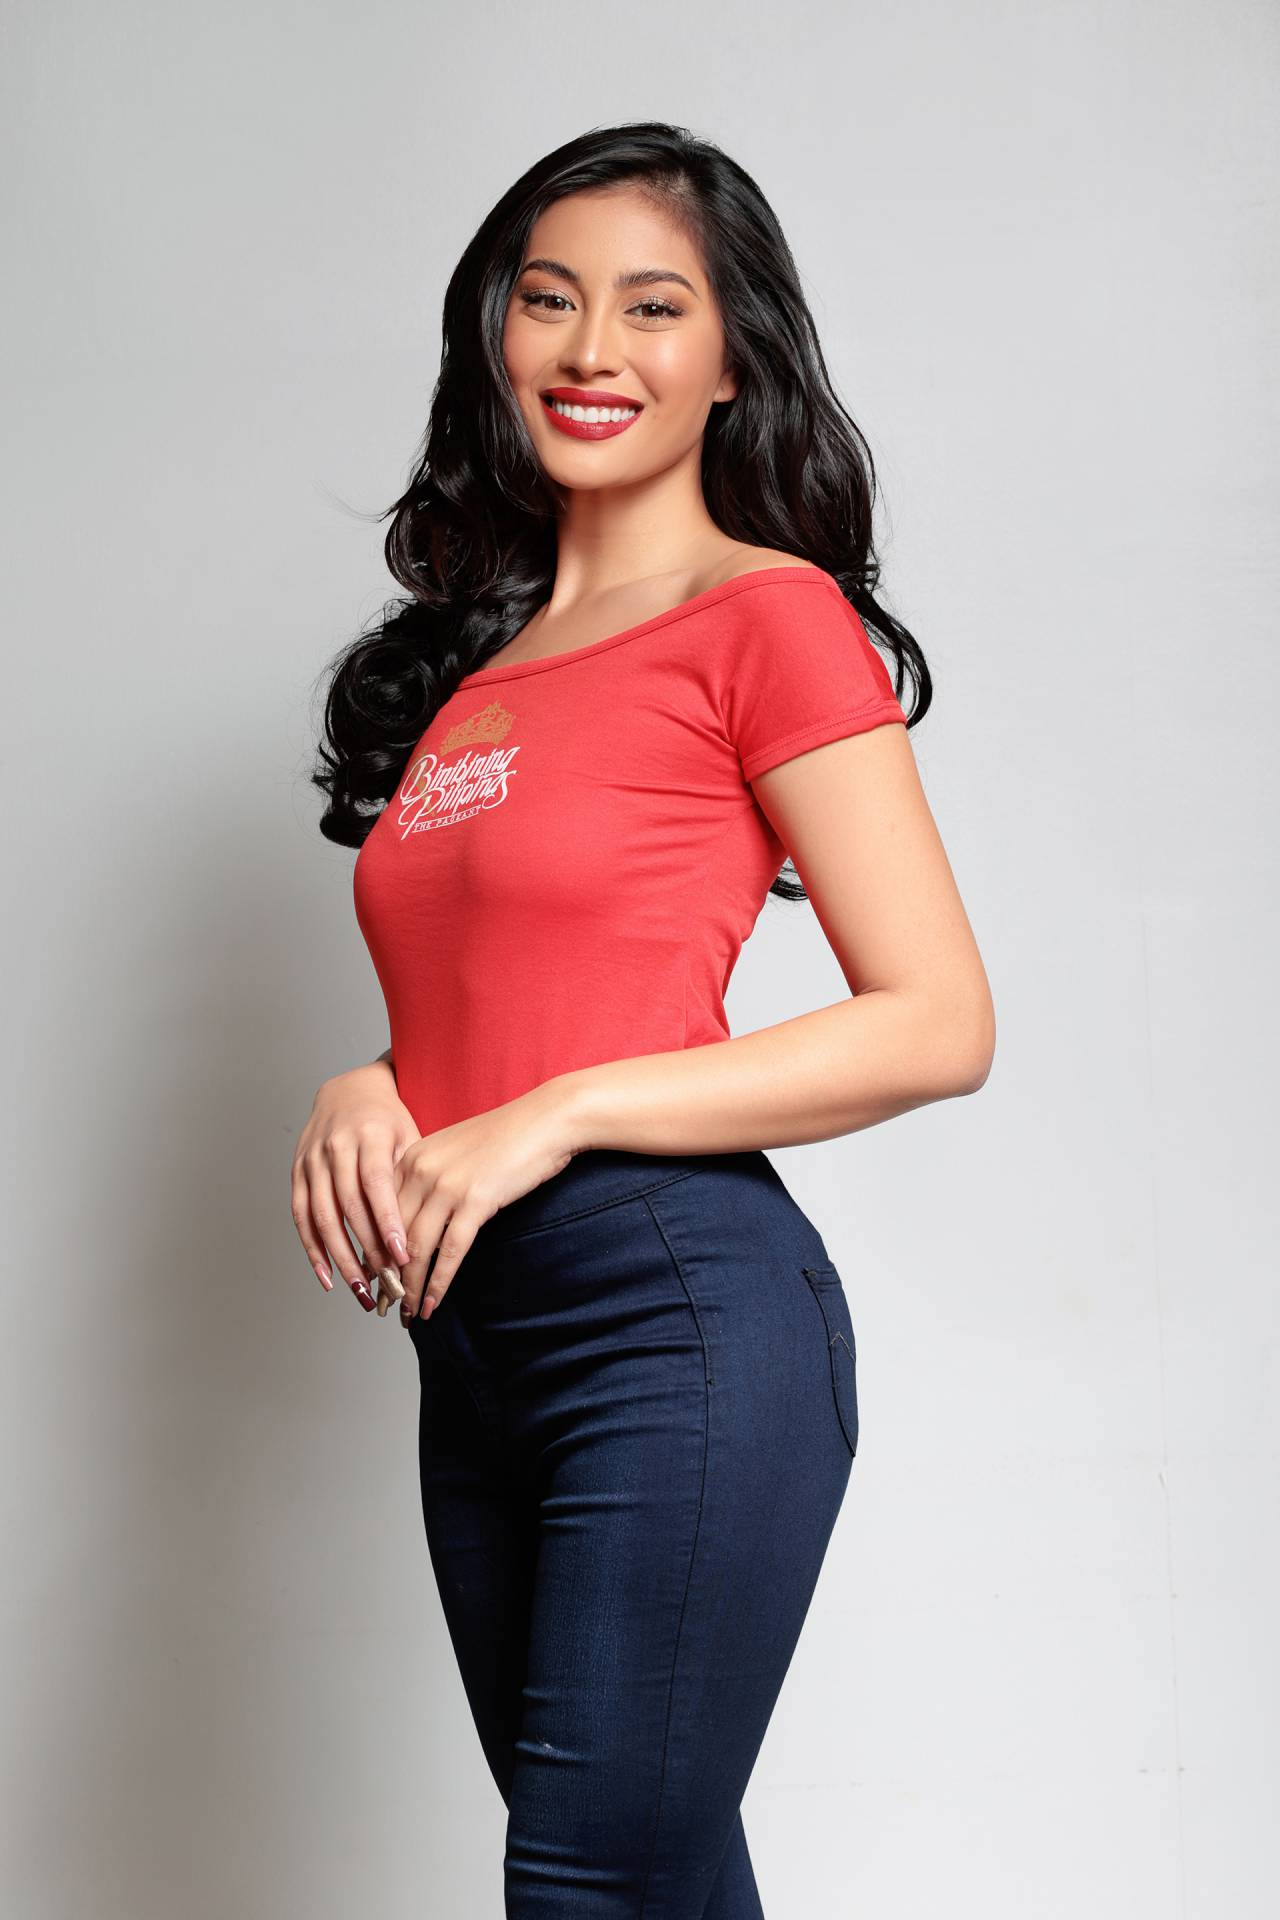 Patrizia Garcia